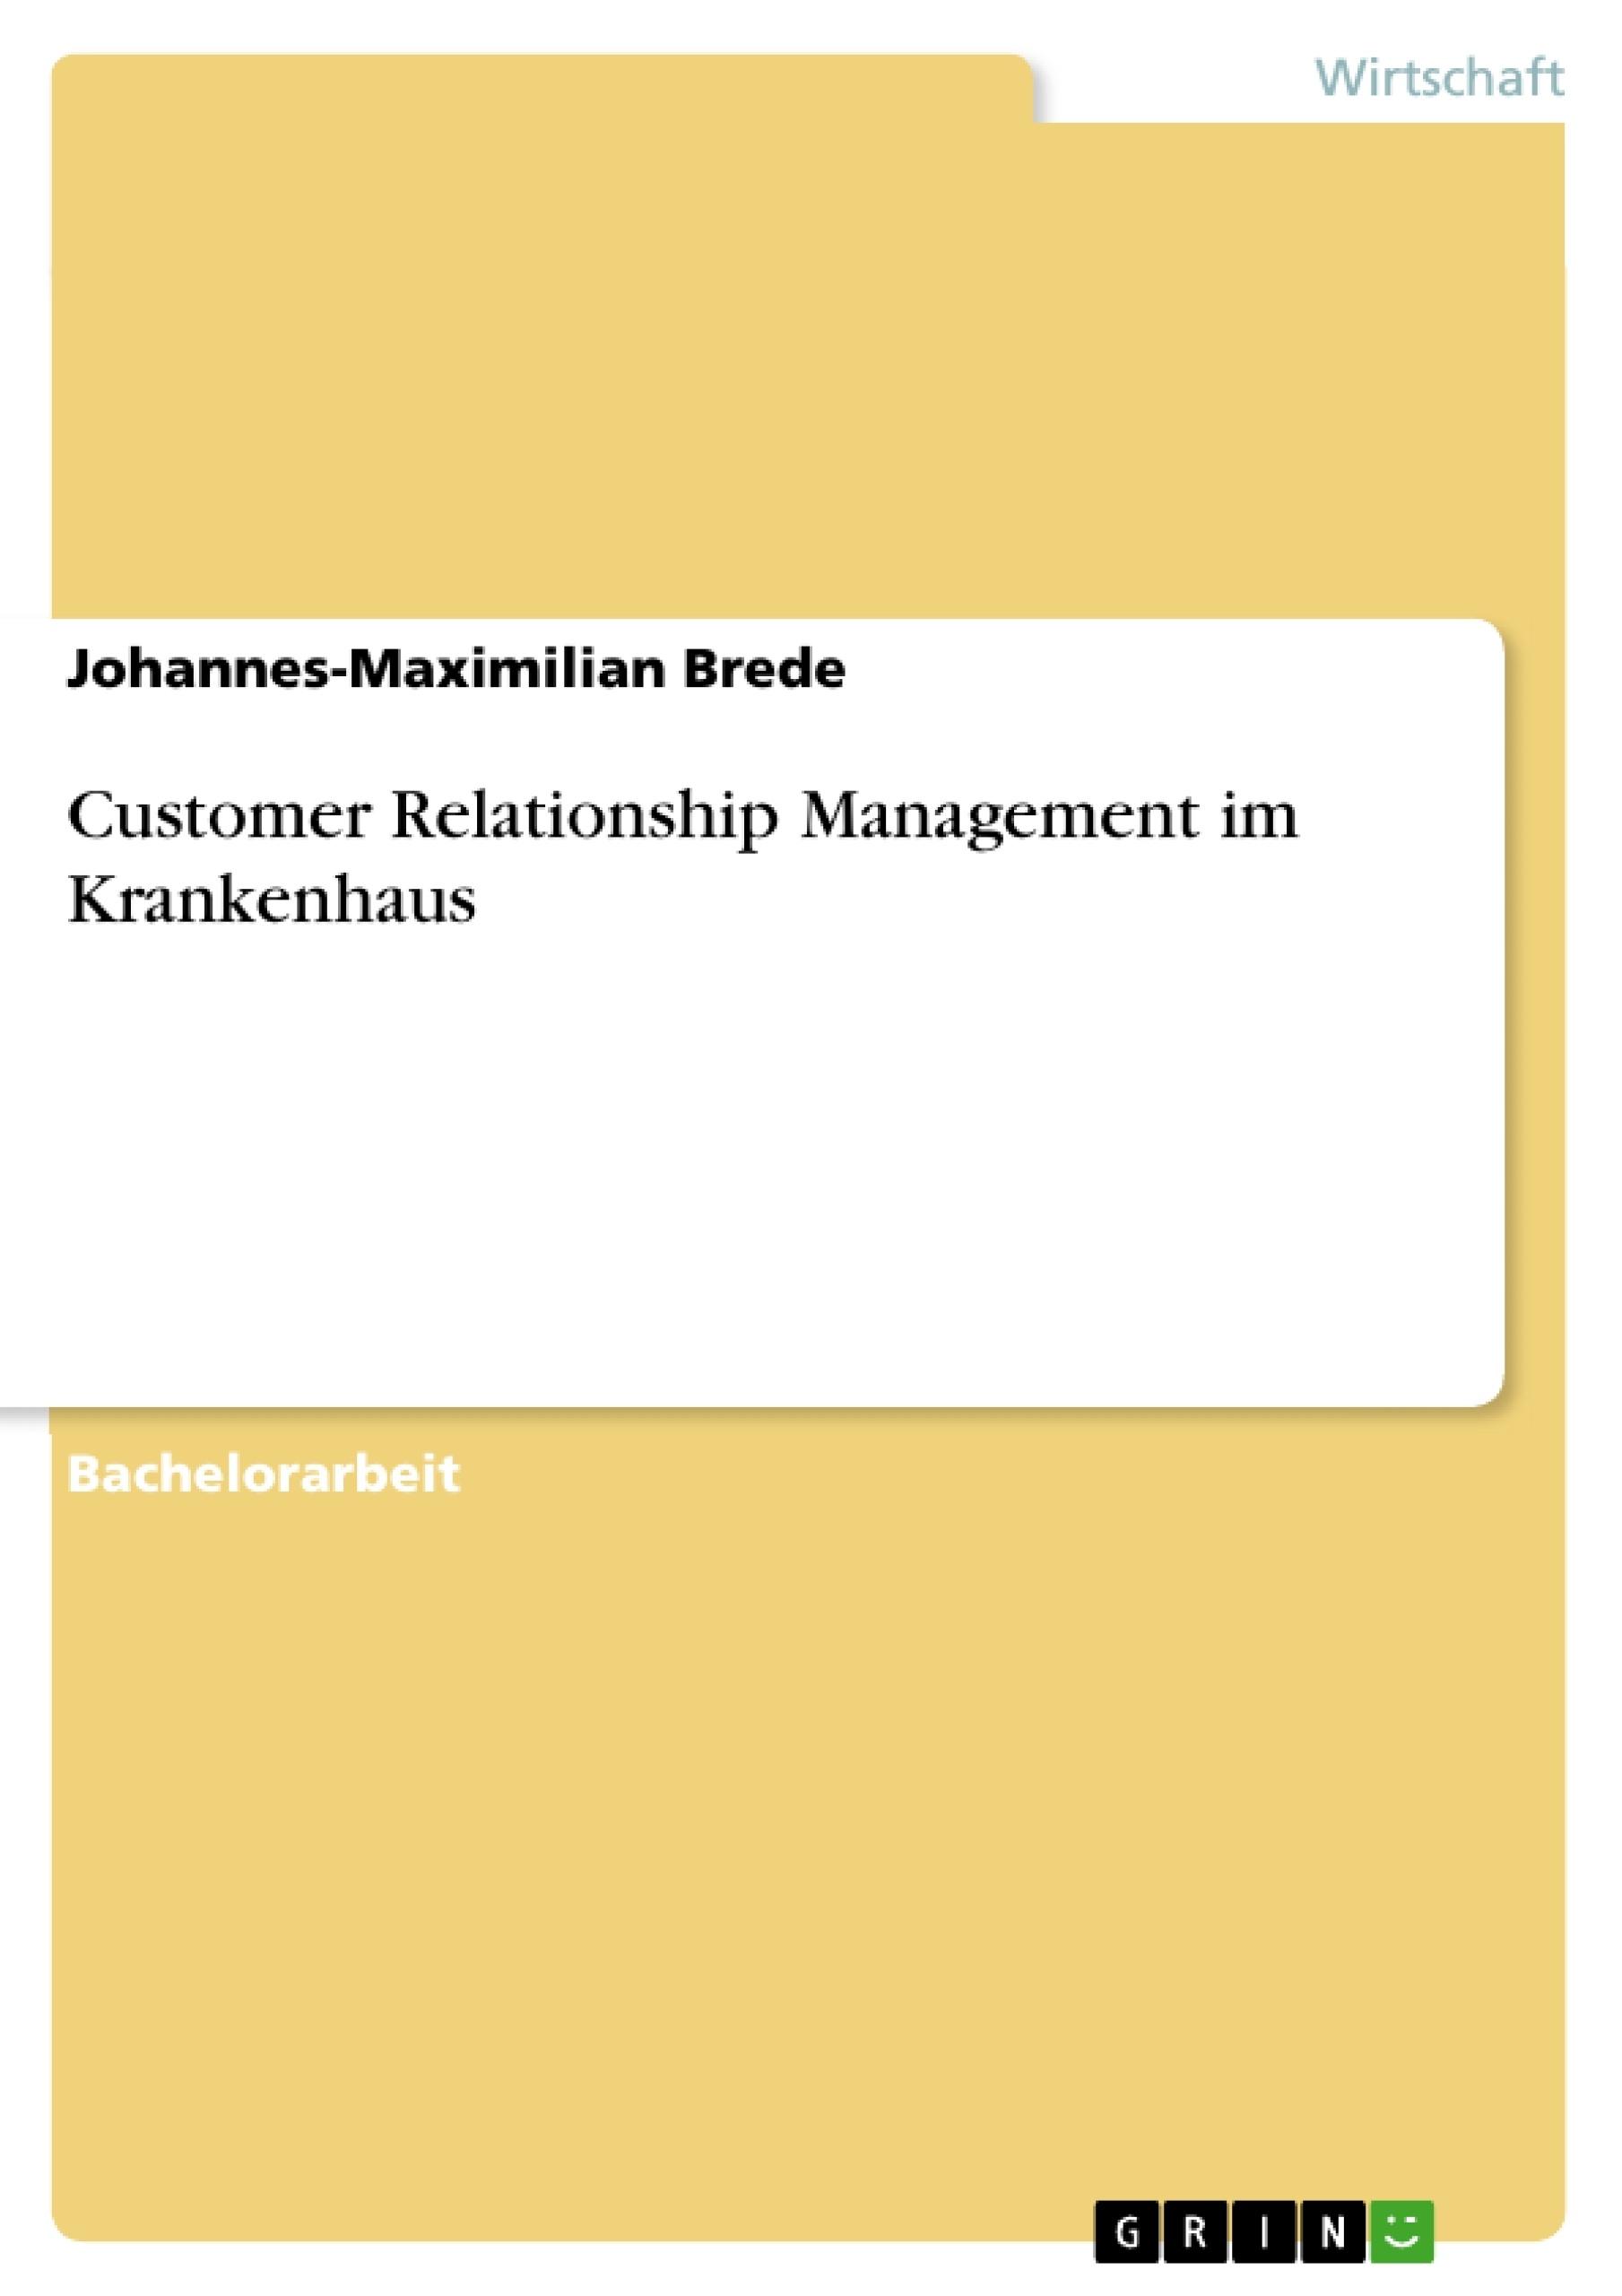 Titel: Customer Relationship Management im Krankenhaus